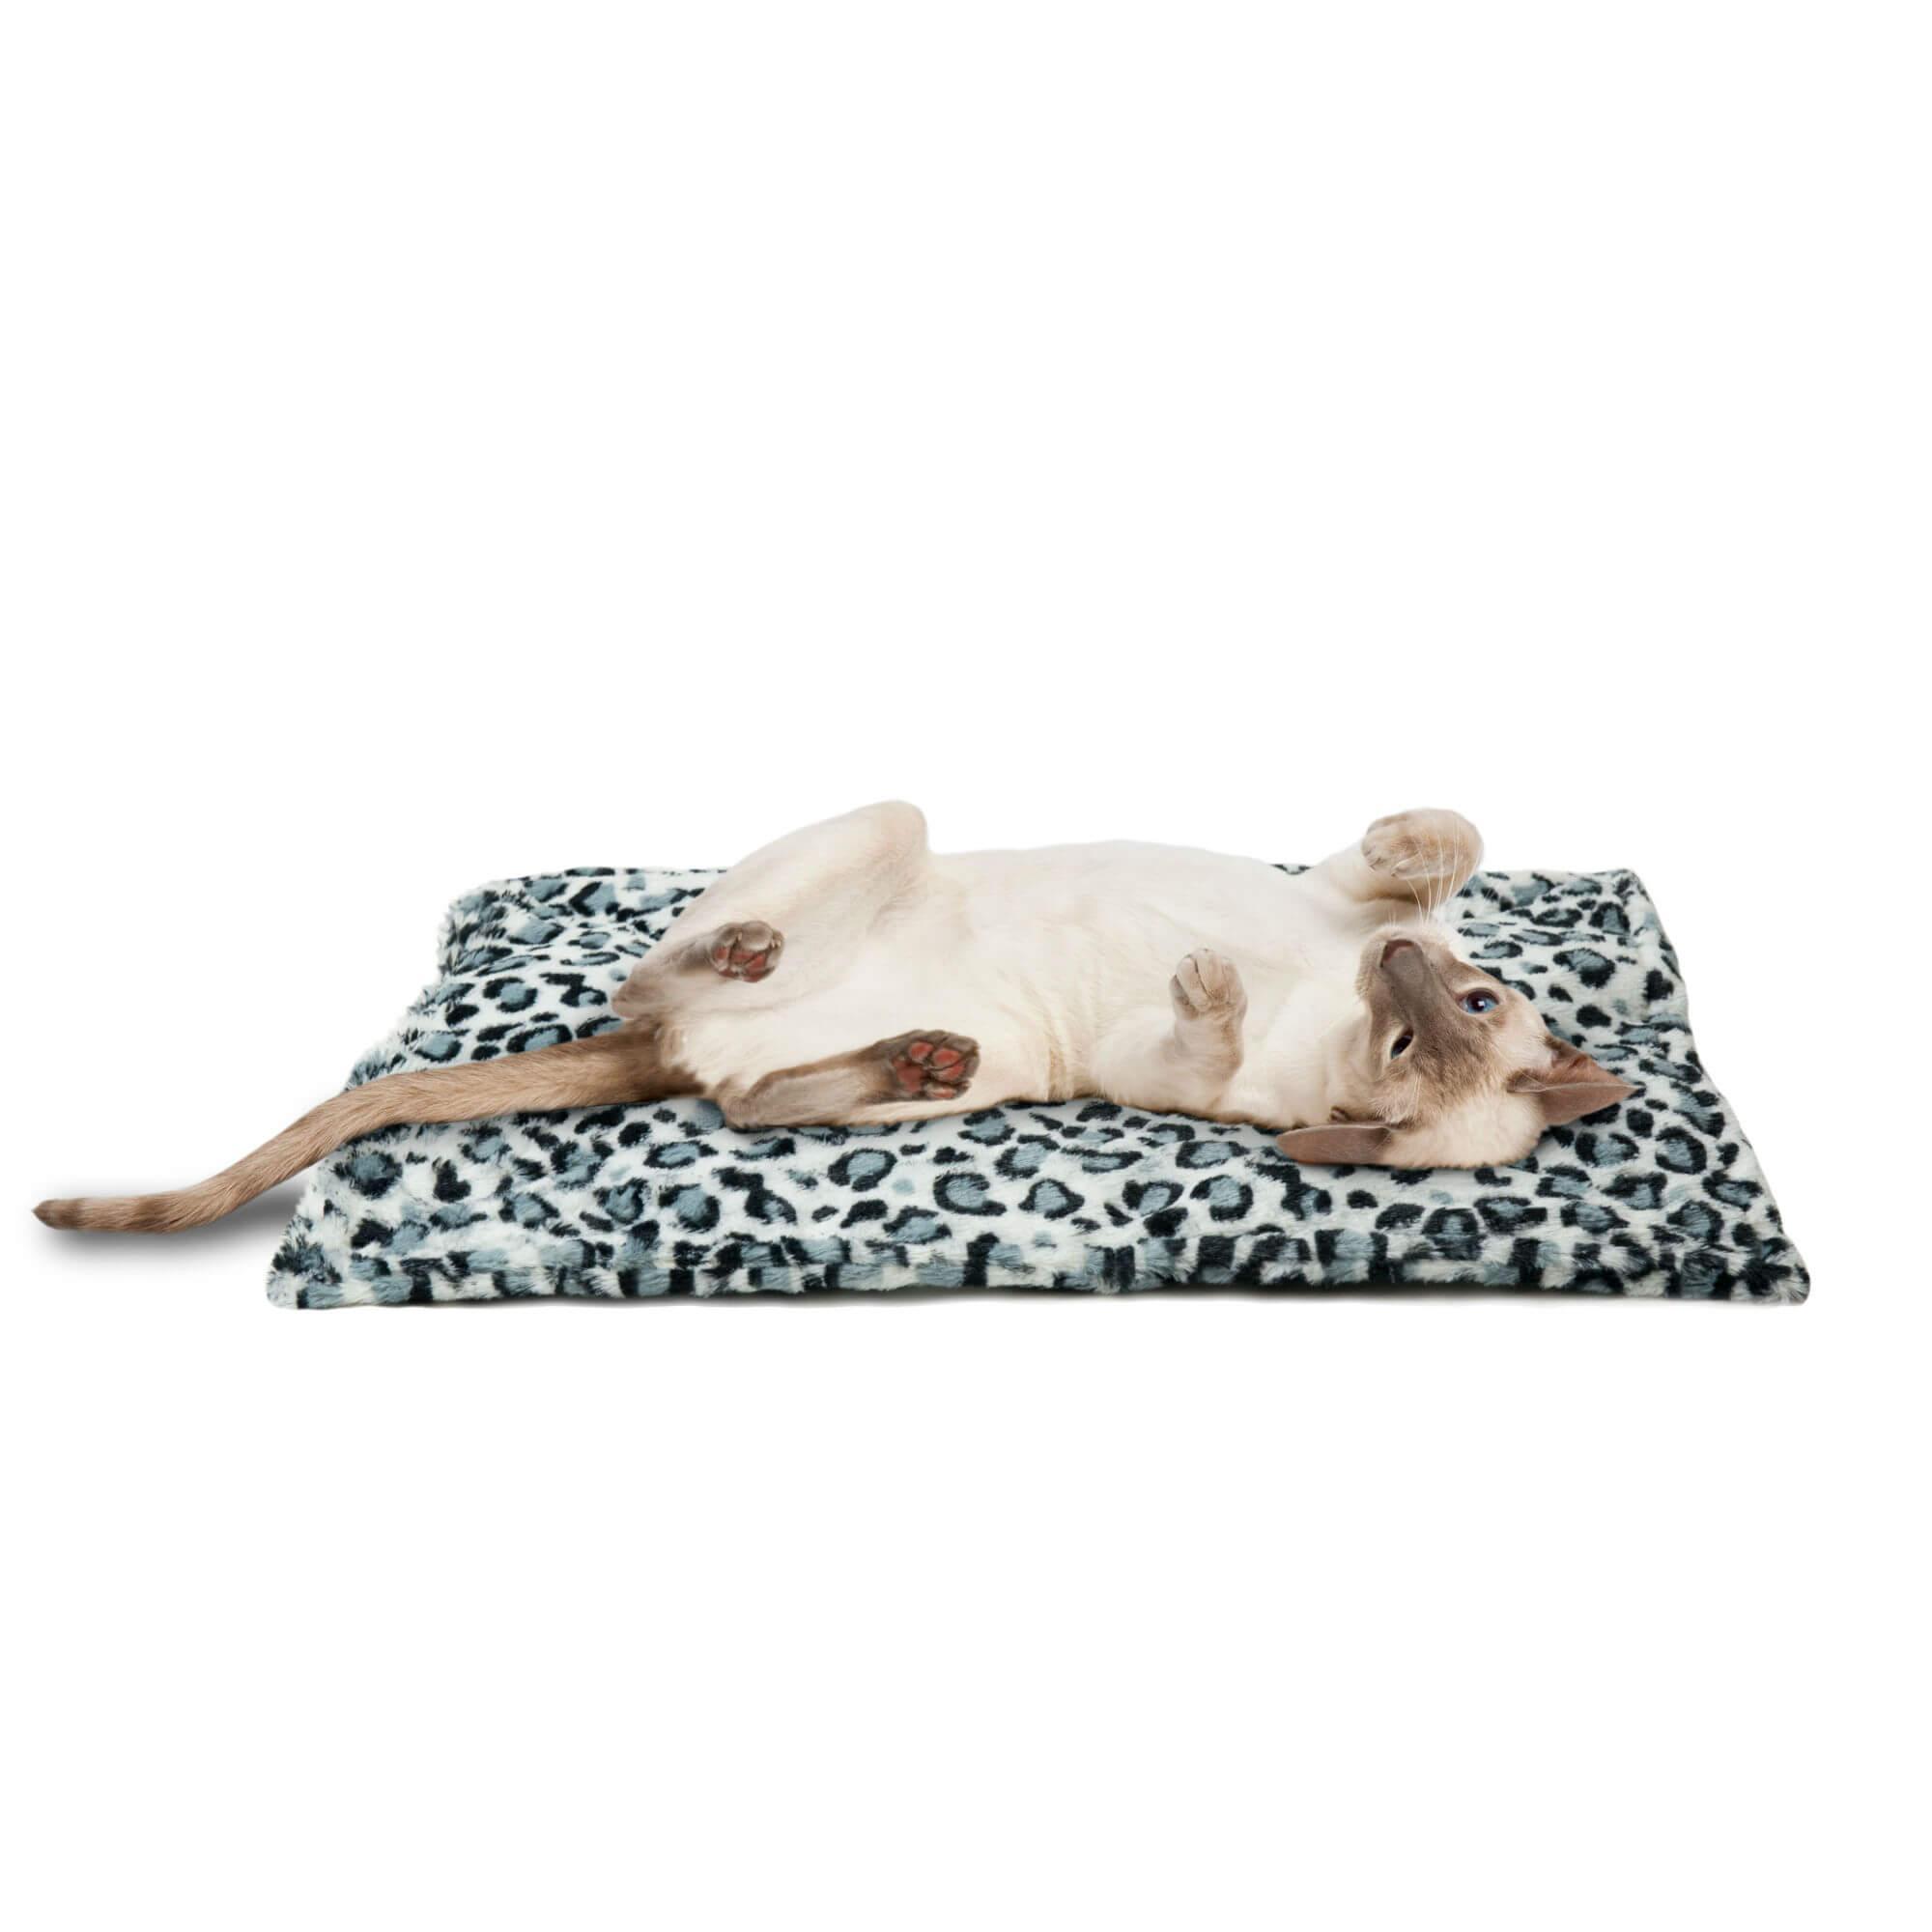 ThermaNAP Faux Fur Self-Warming Pet Mat - Snow Leopard